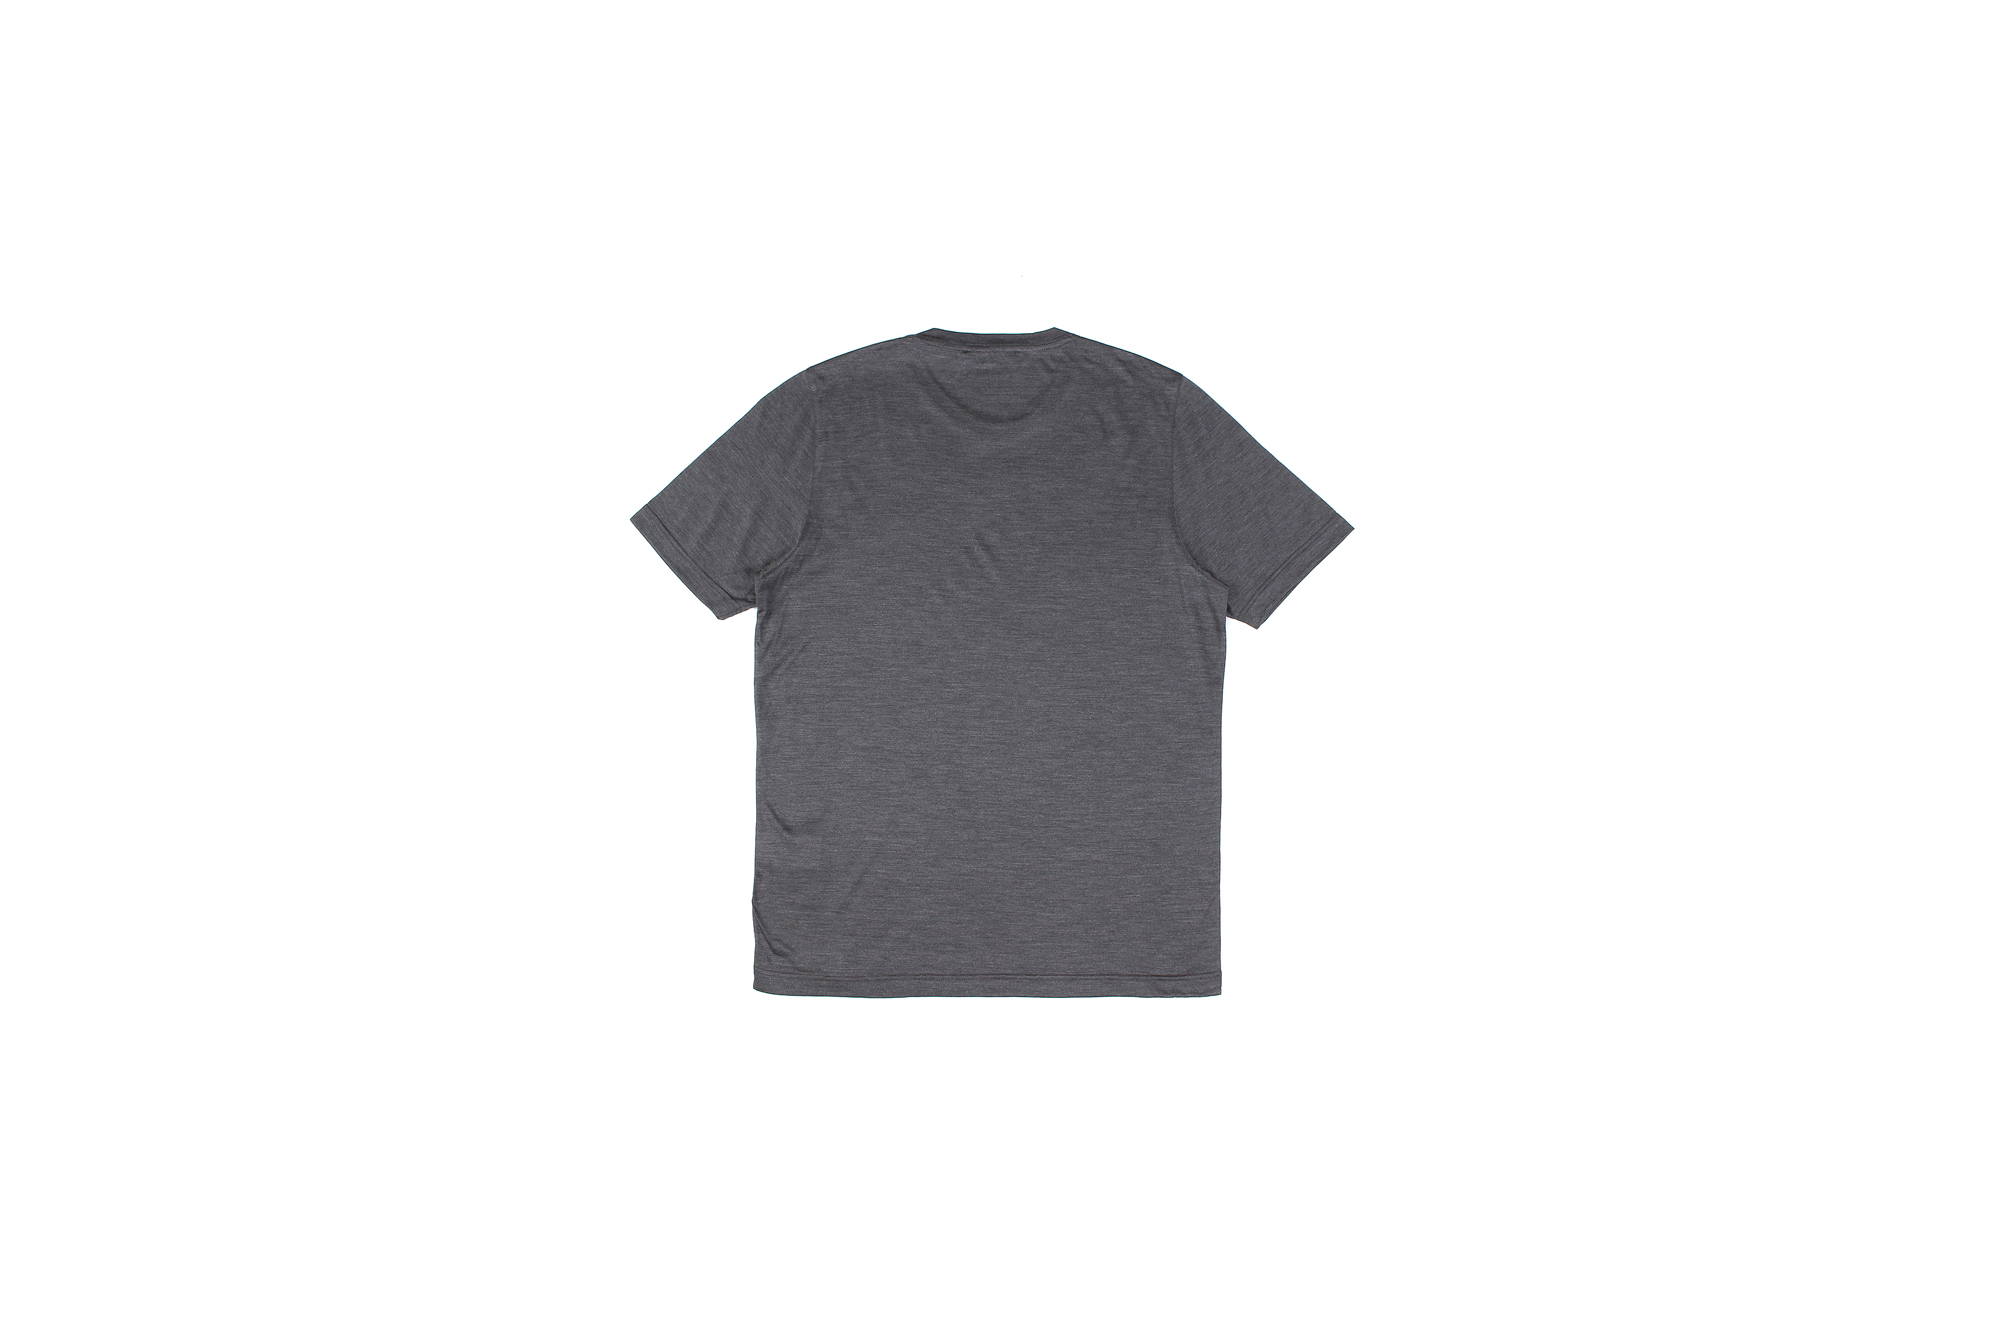 Gran Sasso (グランサッソ) Silk T-shirt (シルク Tシャツ) SETA (シルク 100%) ショートスリーブ シルク Tシャツ GREY (グレー・264) made in italy (イタリア製) 2021 春夏新作 愛知 名古屋 Alto e Diritto altoediritto アルトエデリット